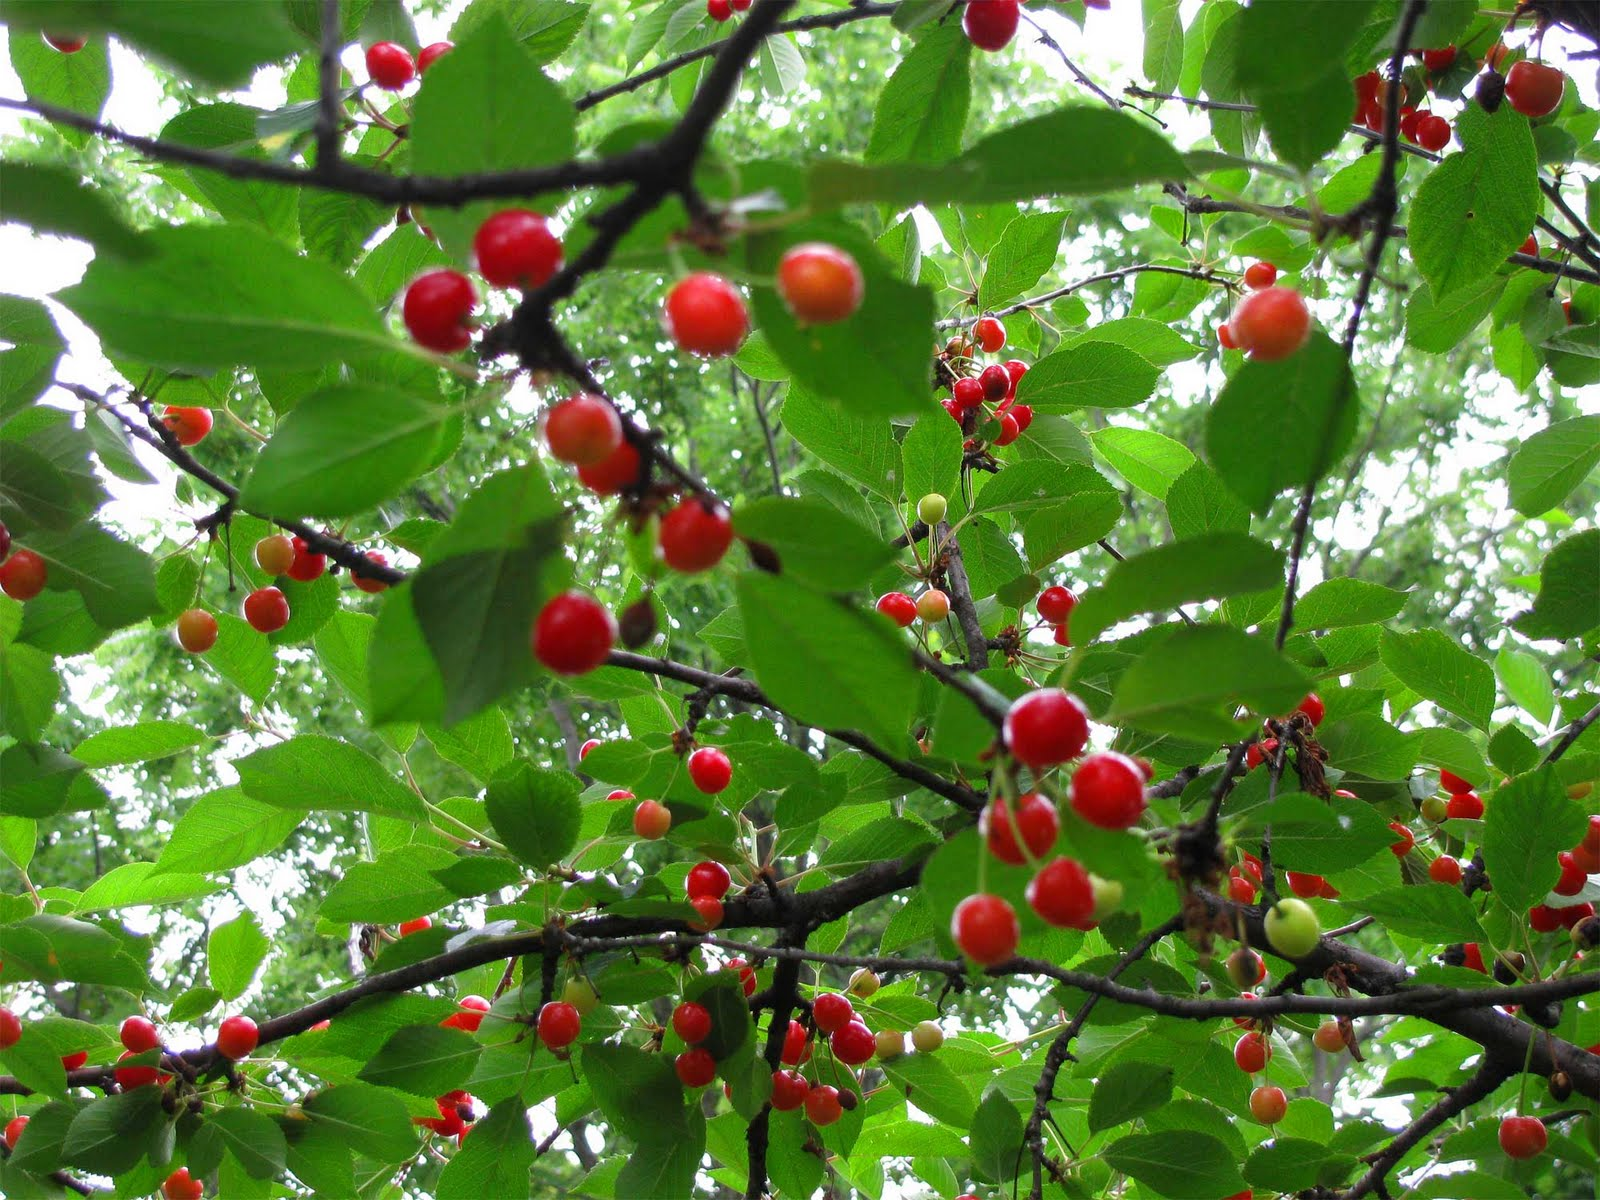 k cherry tree cherries sky island daily photo hydrangea